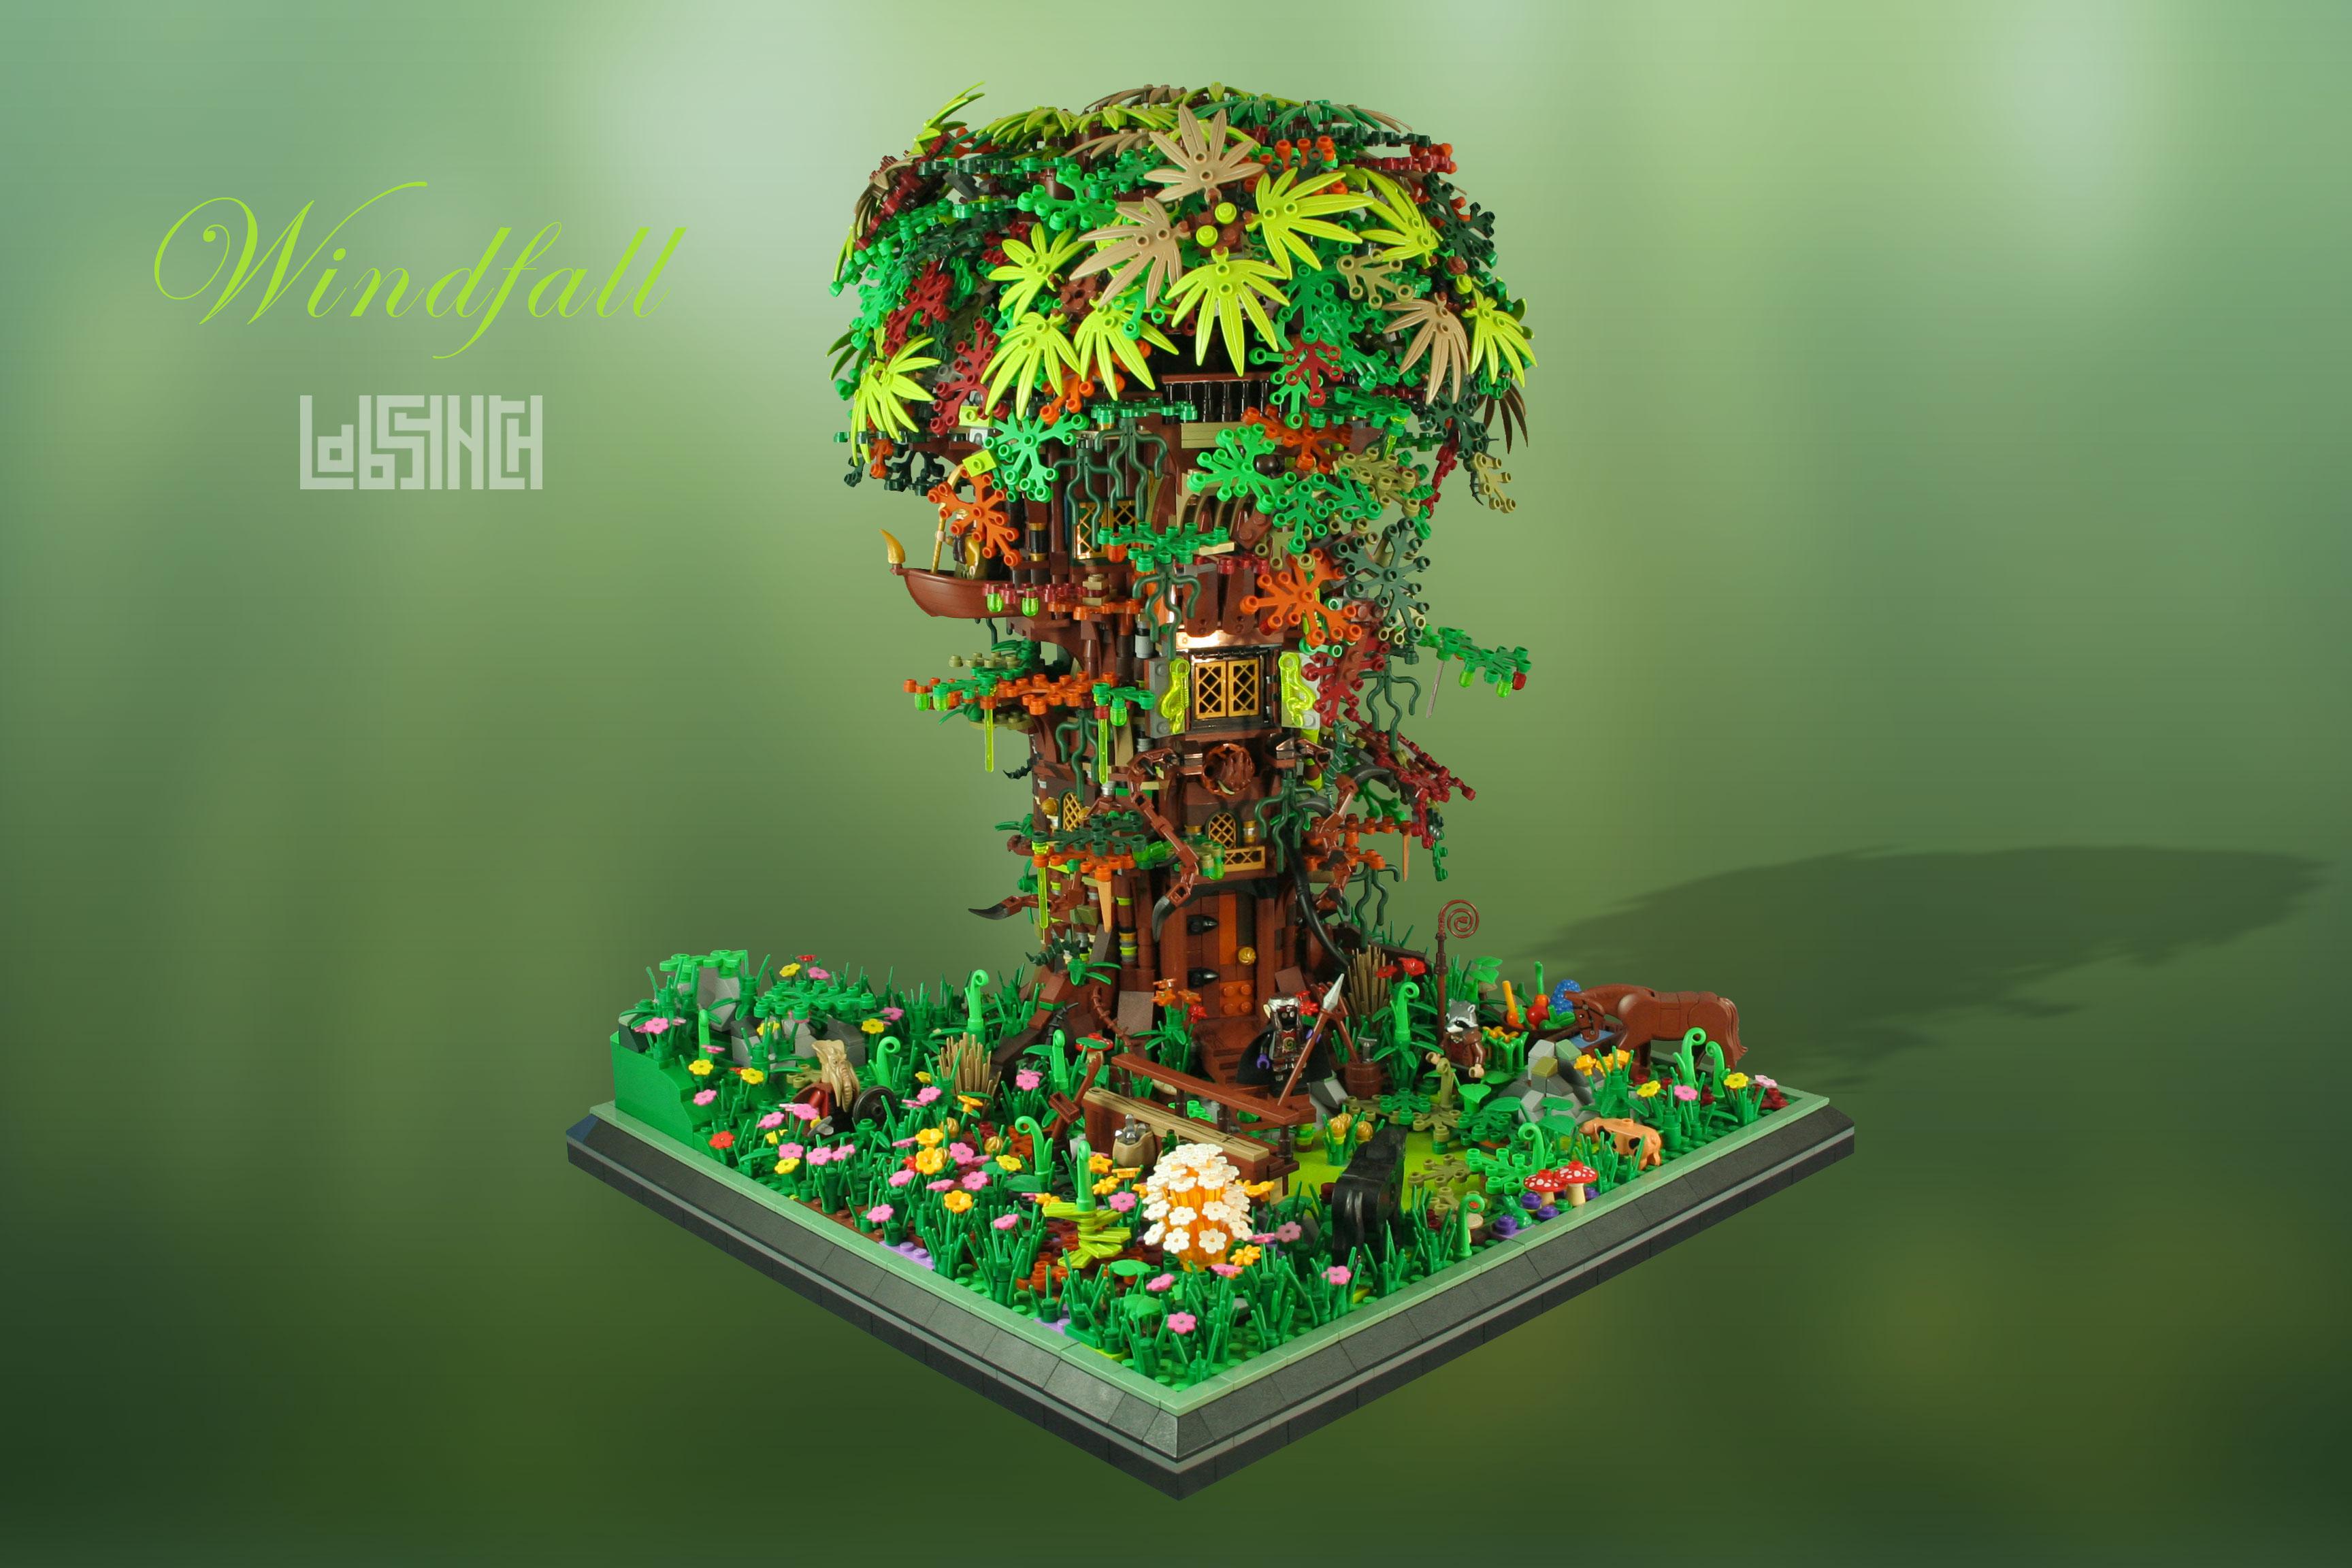 LEGO-MOC-Windfall-01